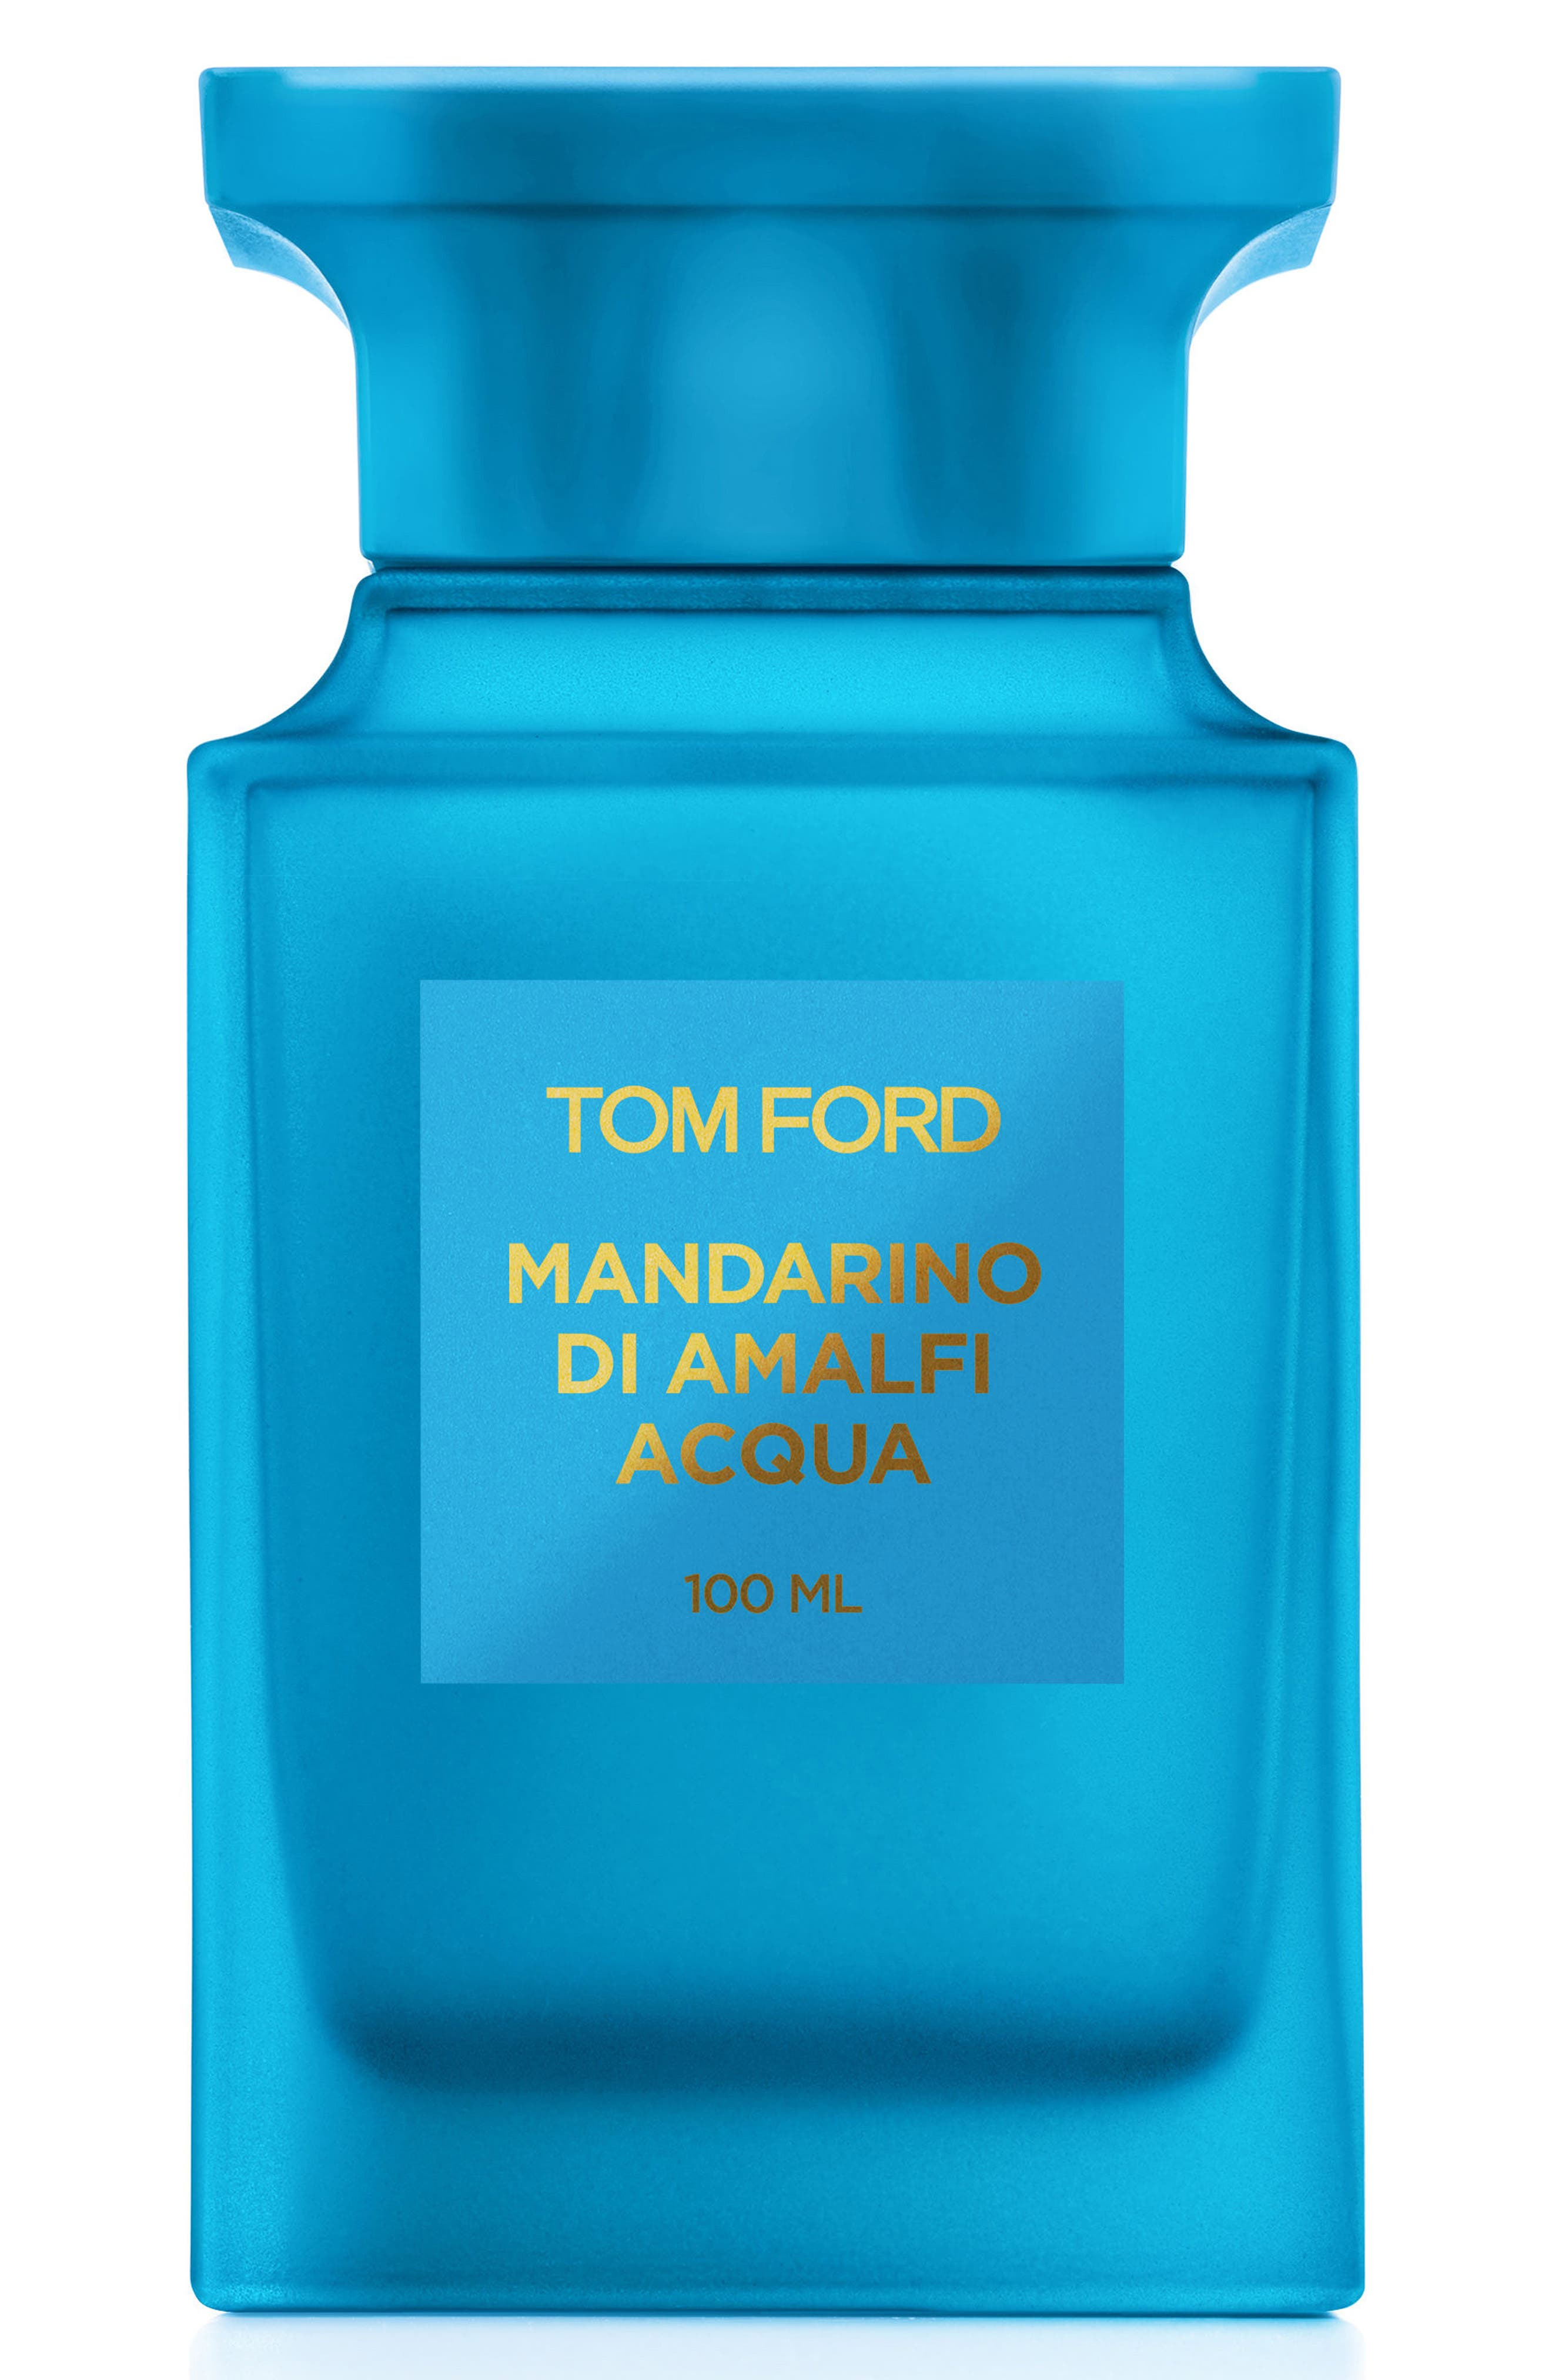 TOM FORD Mandarino di Amalfi Acqua Eau de Toilette, Main, color, NO COLOR